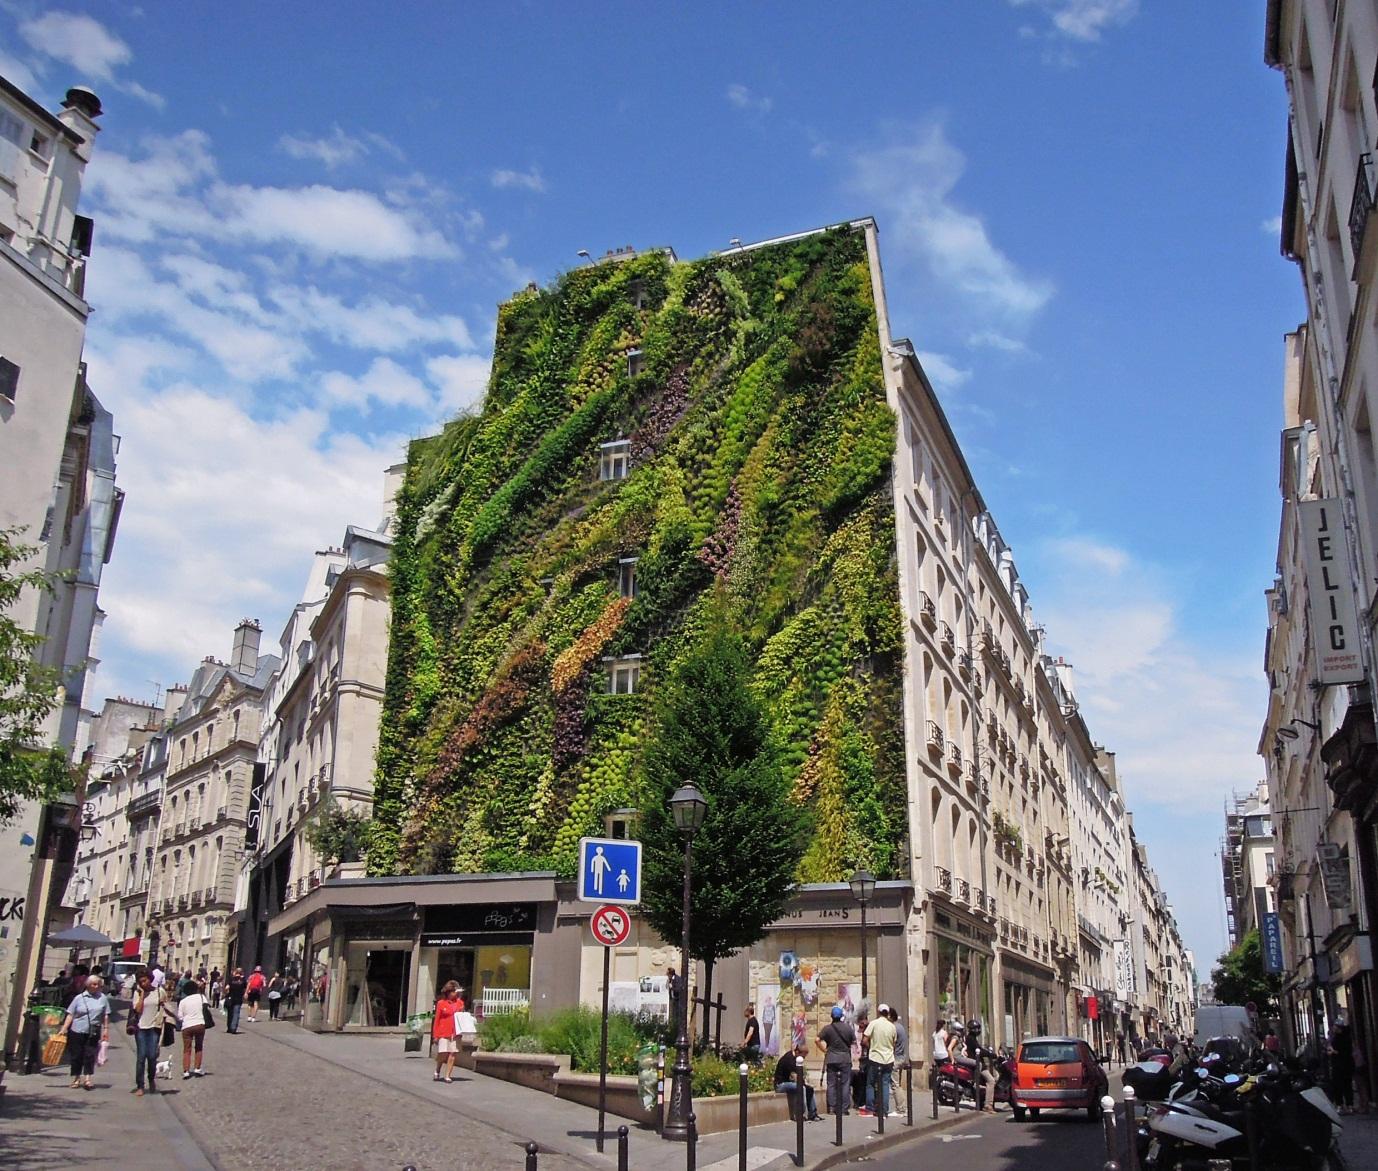 Patrick Blanc's vertical garden